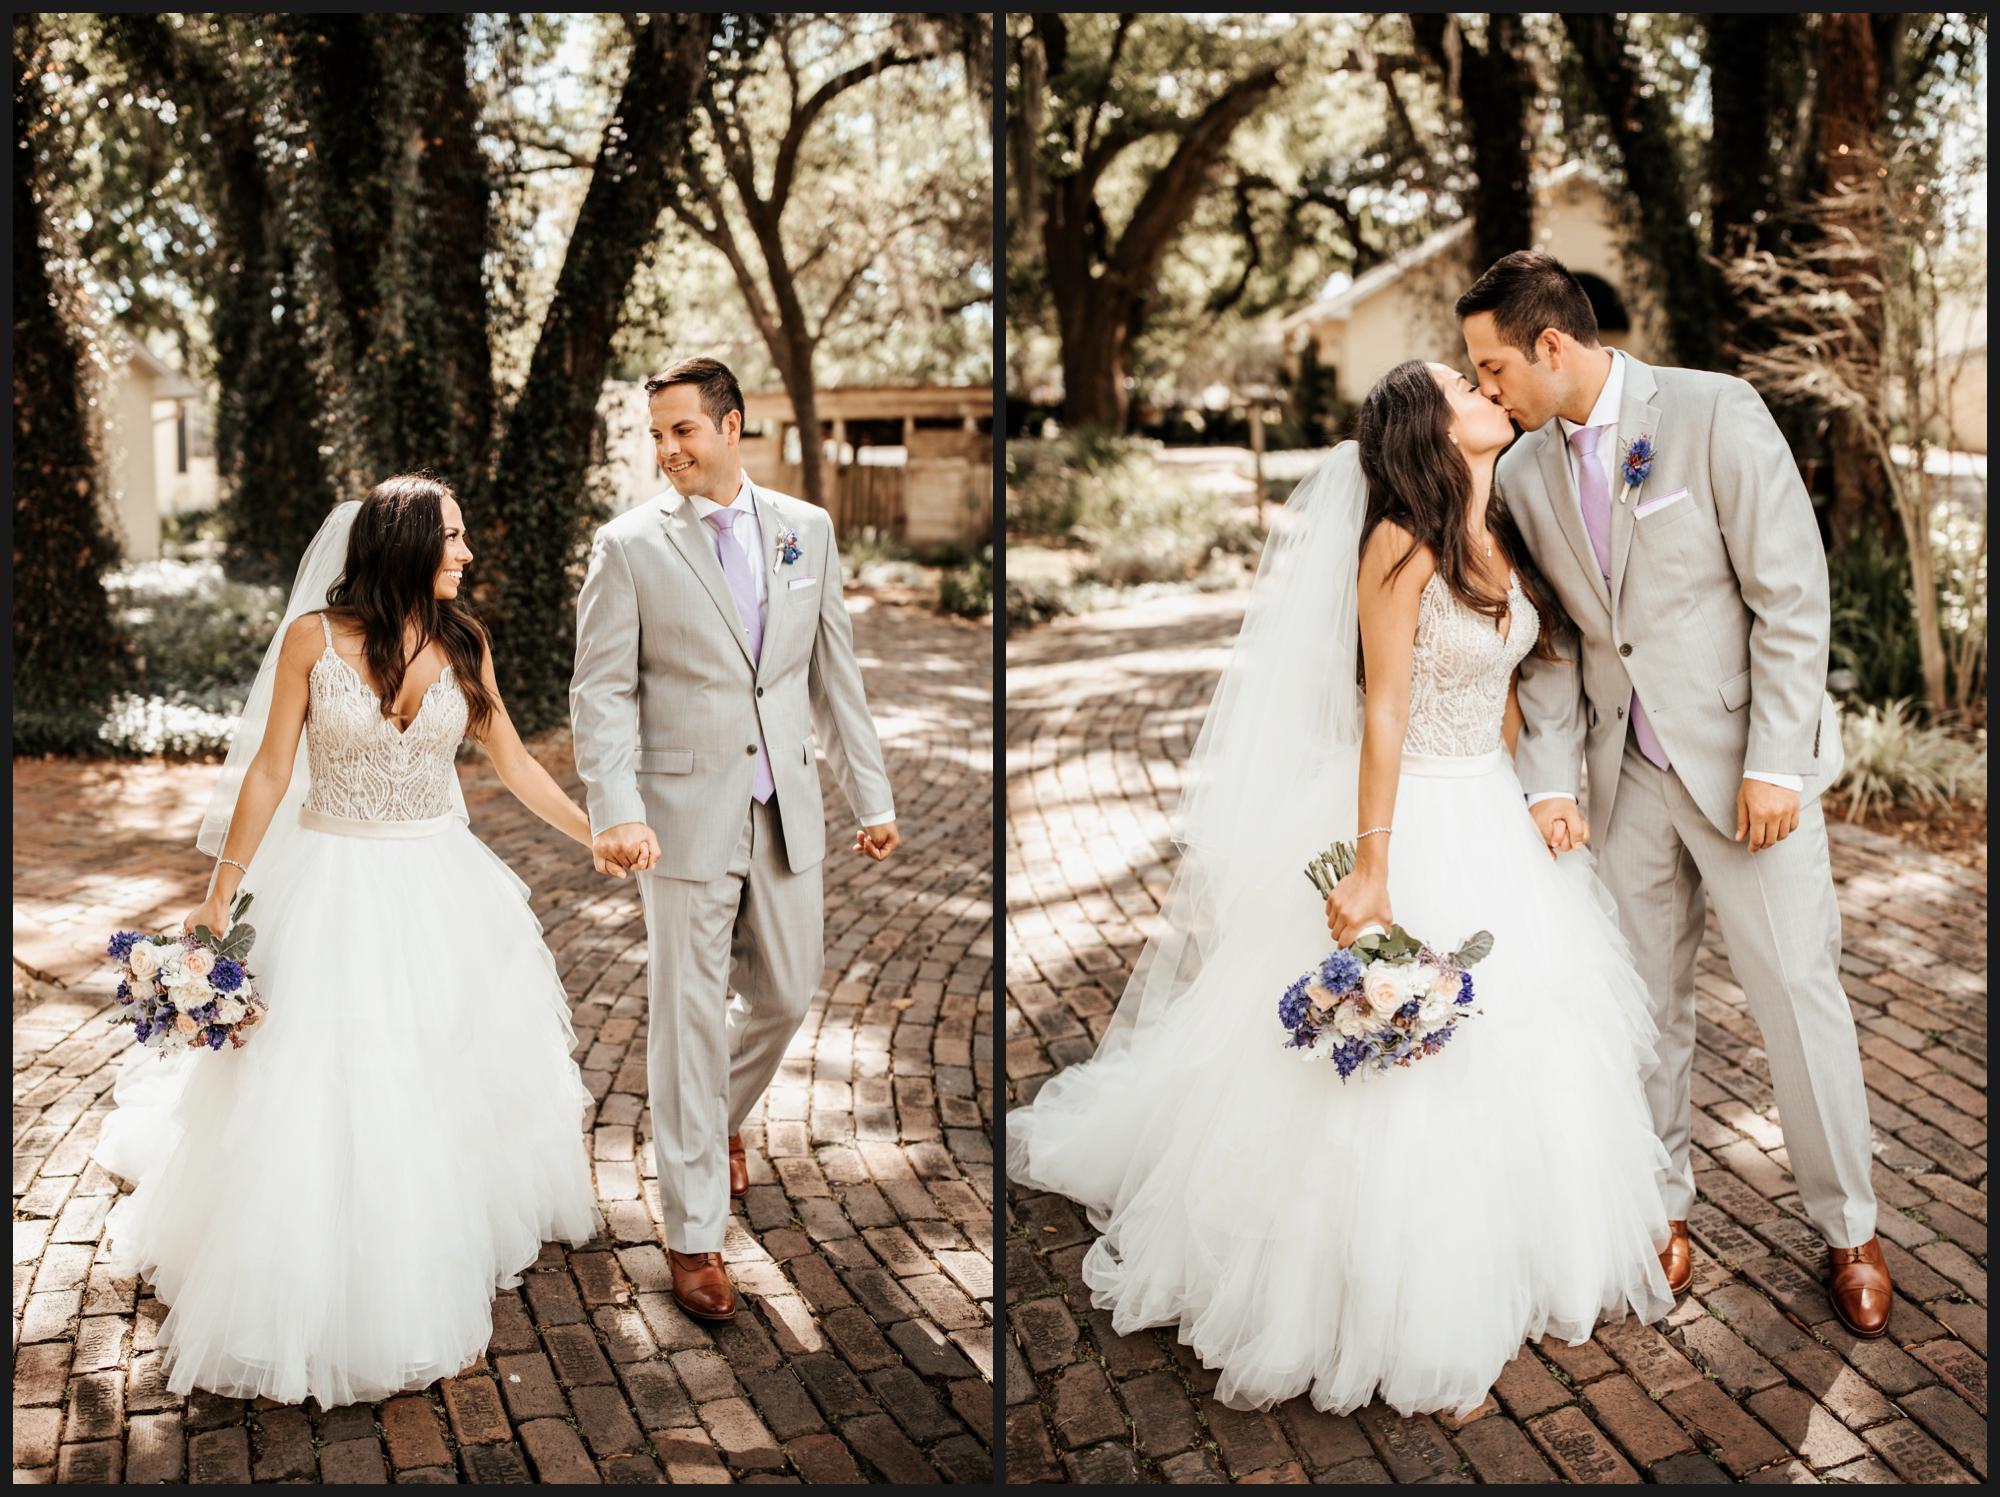 Orlando-Wedding-Photographer-destination-wedding-photographer-florida-wedding-photographer-bohemian-wedding-photographer_1559.jpg